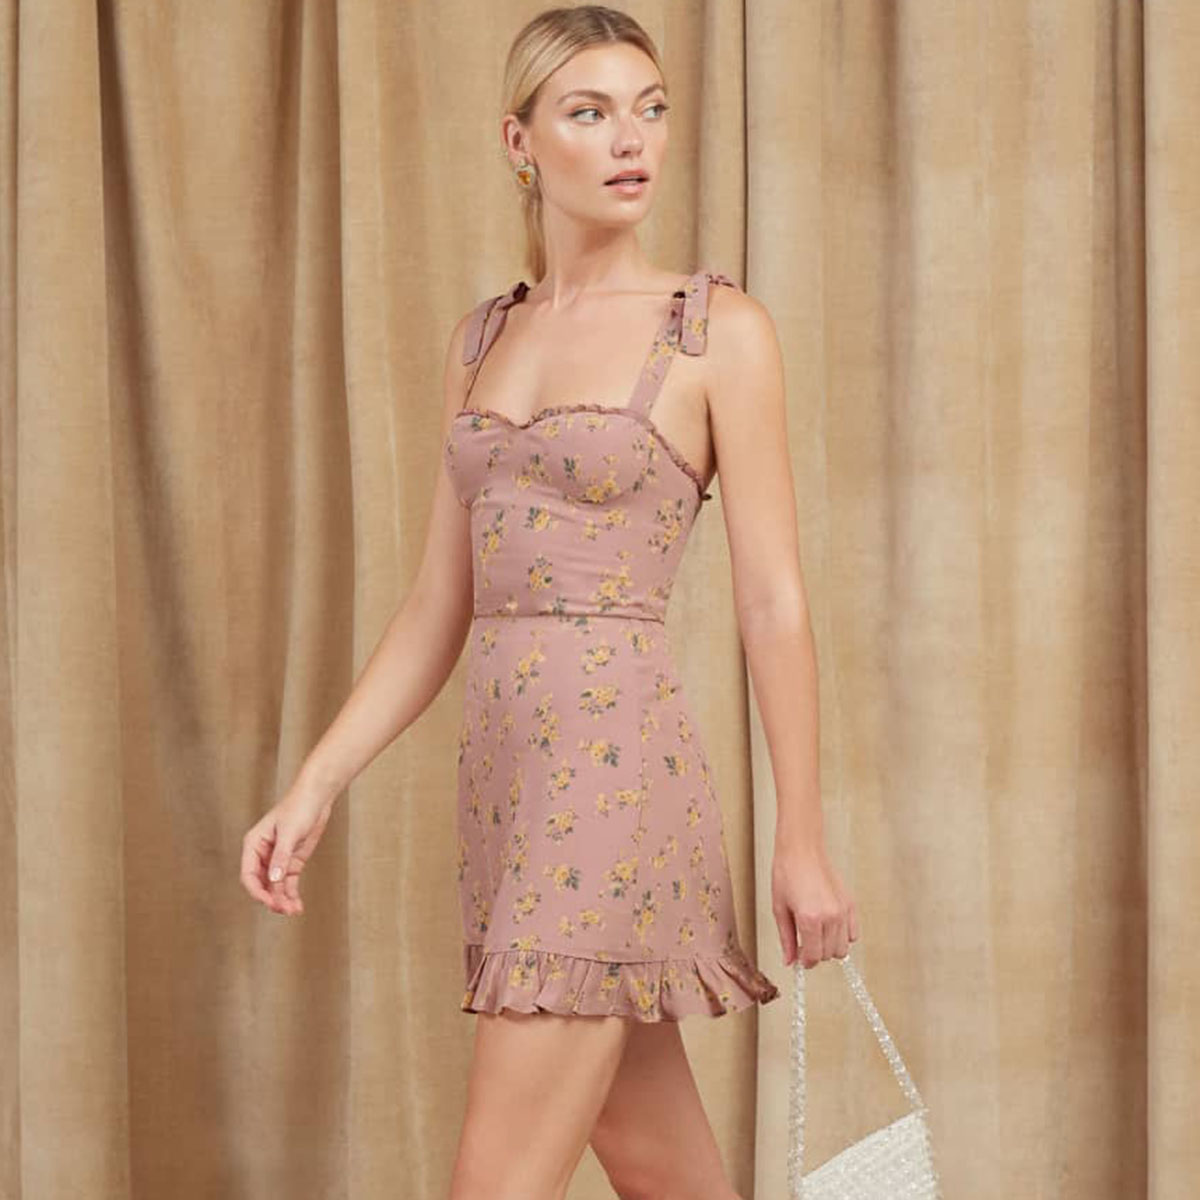 4448d3f2b7c9f Christine Pink Mini Dress Women 2019 Summer Sleeveless Bandage Strapless  Sexy Dress Ladies Ruffles Backless Elegant Short Dress